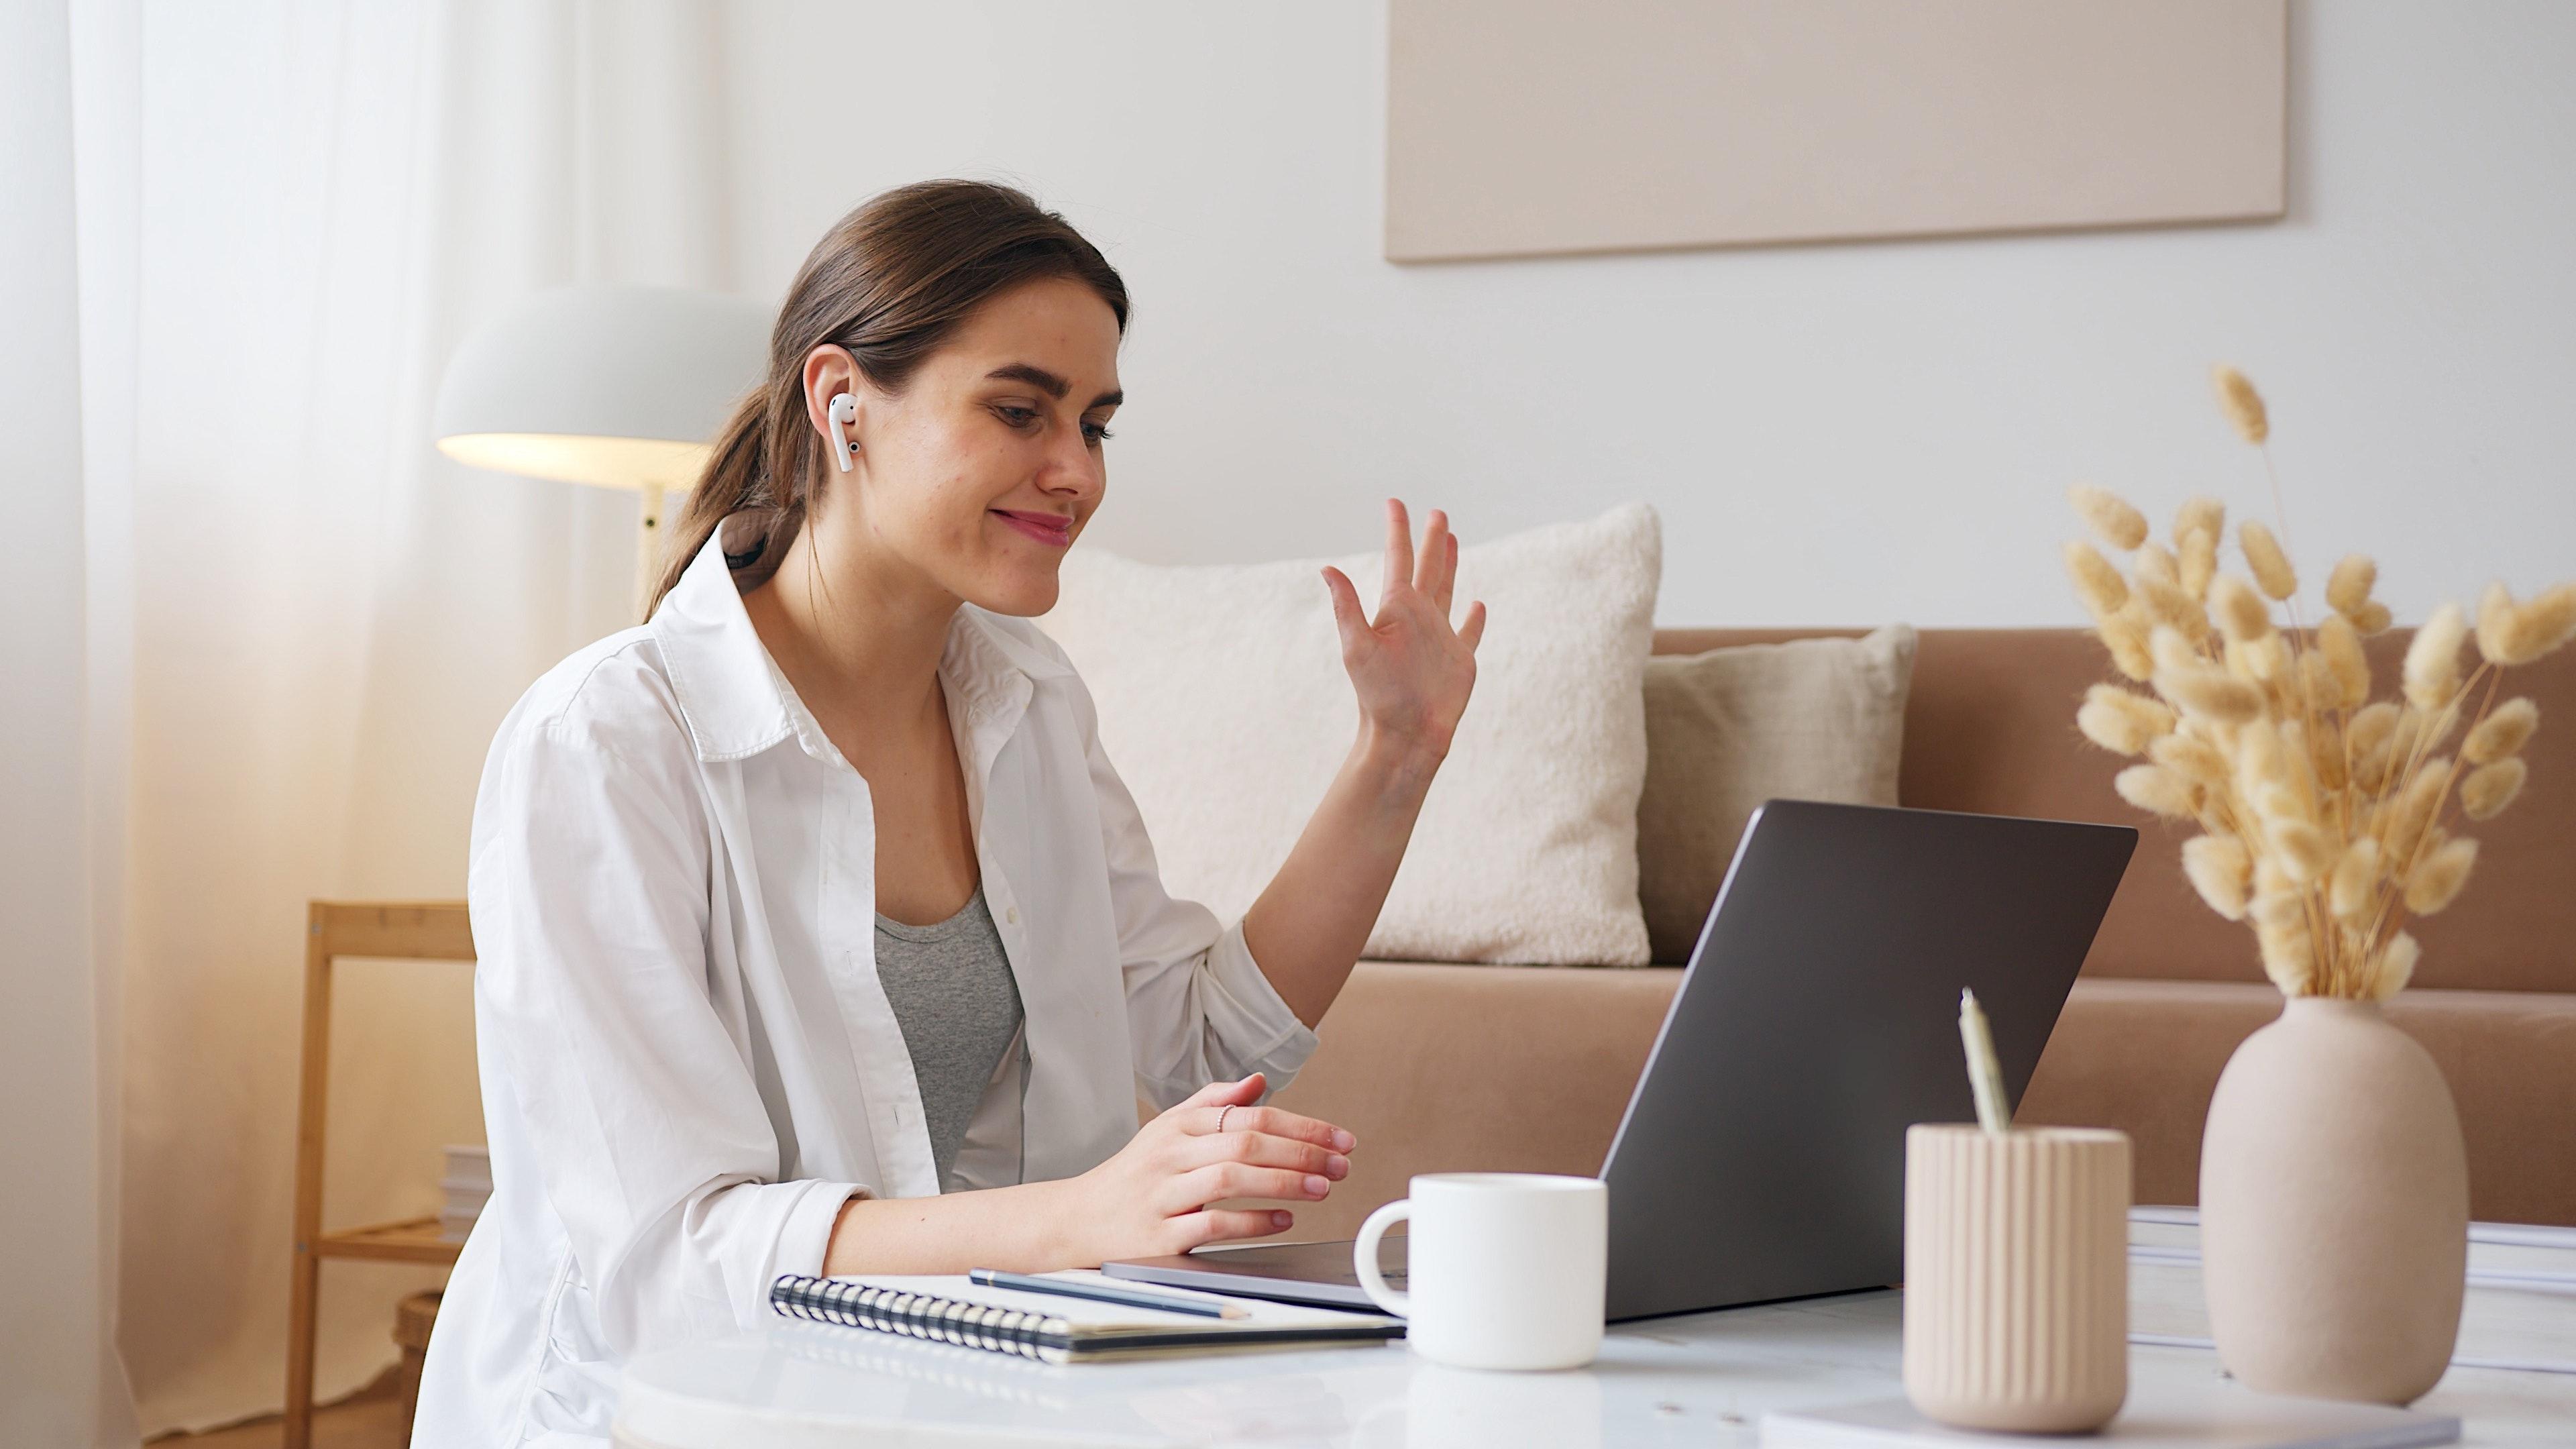 cheerful-woman-having-video-call-via-laptop-4492135